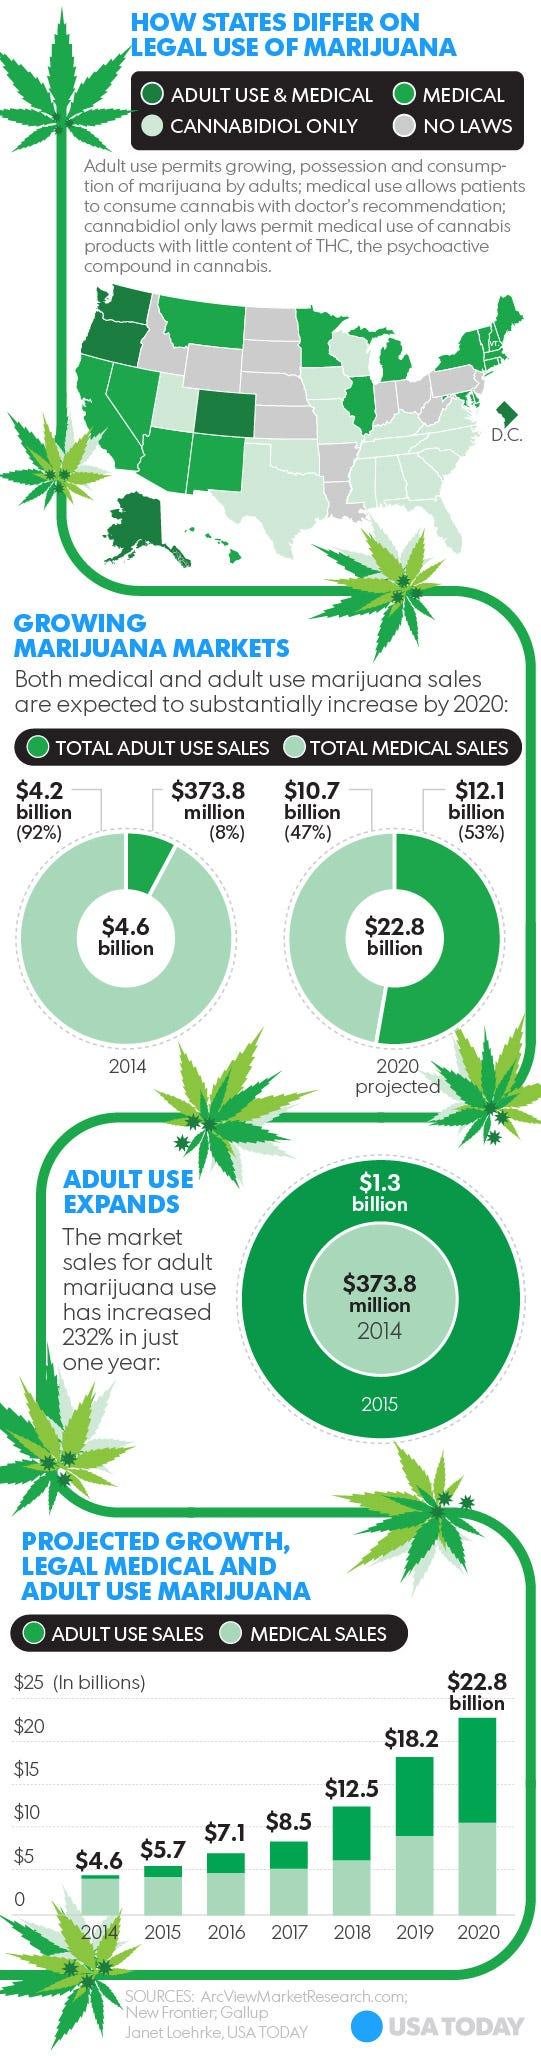 Whoopi Goldberg founds medical marijuana company for women